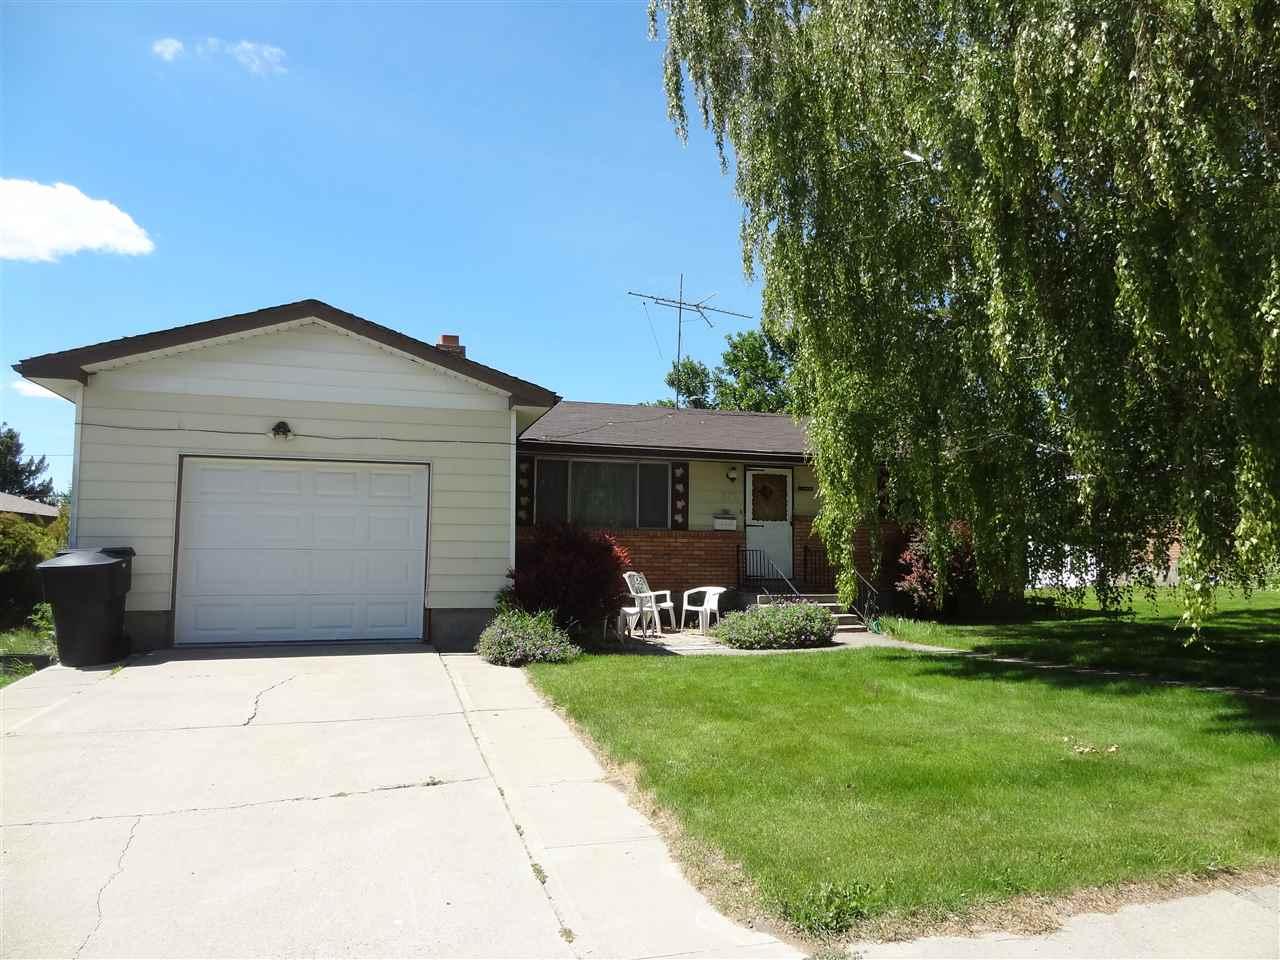 670 Bennett Property Photo - American Falls, ID real estate listing